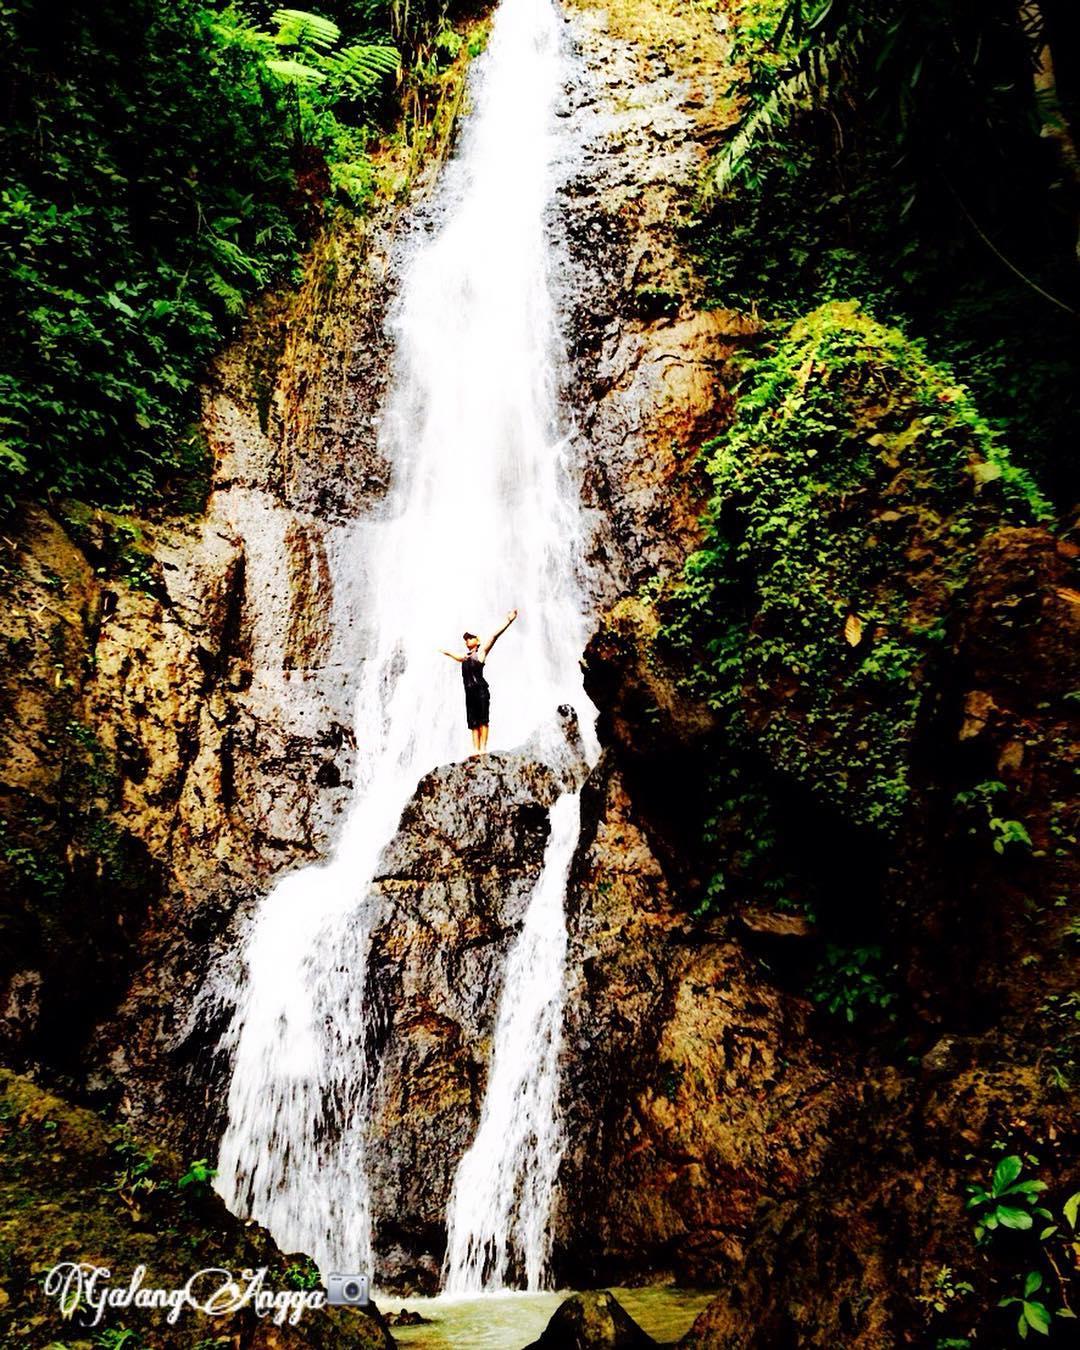 24 Tempat Wisata Karanganyar Hits Jago Grojogan Jurang Jero Air